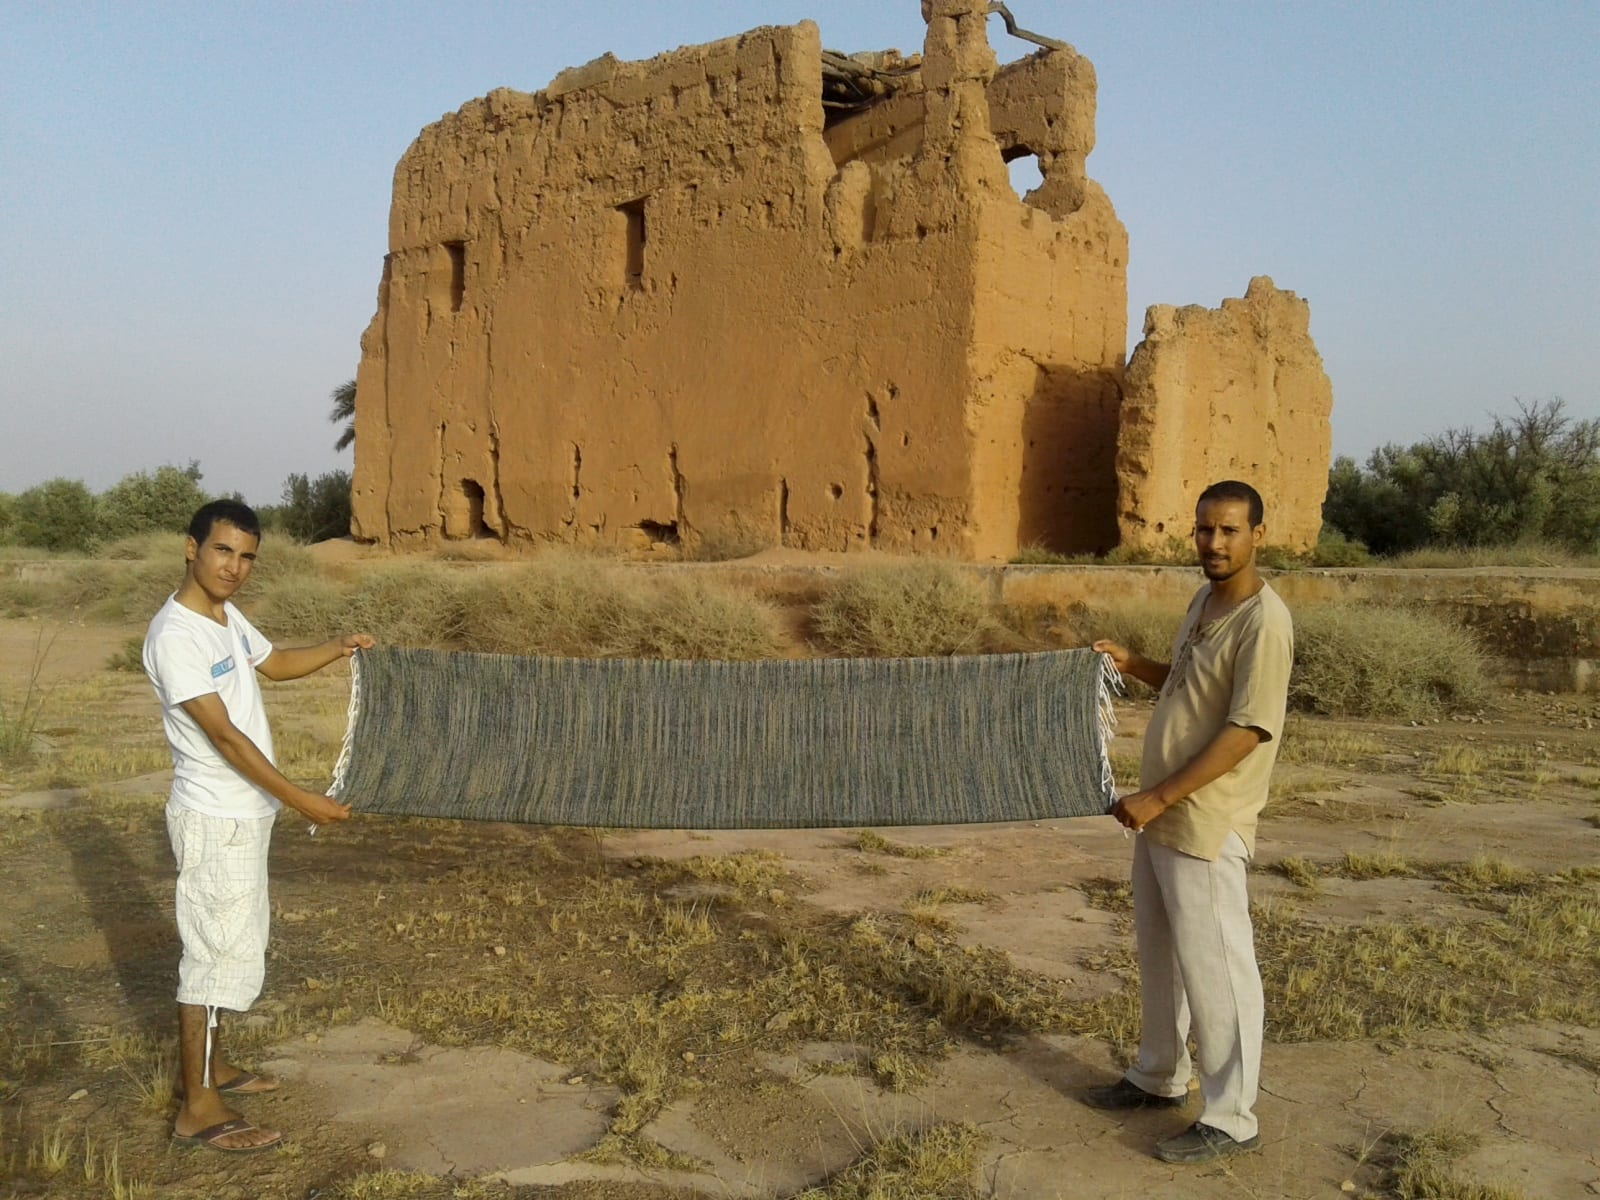 Towel Cotton Thread and Chenille Colored Morocco